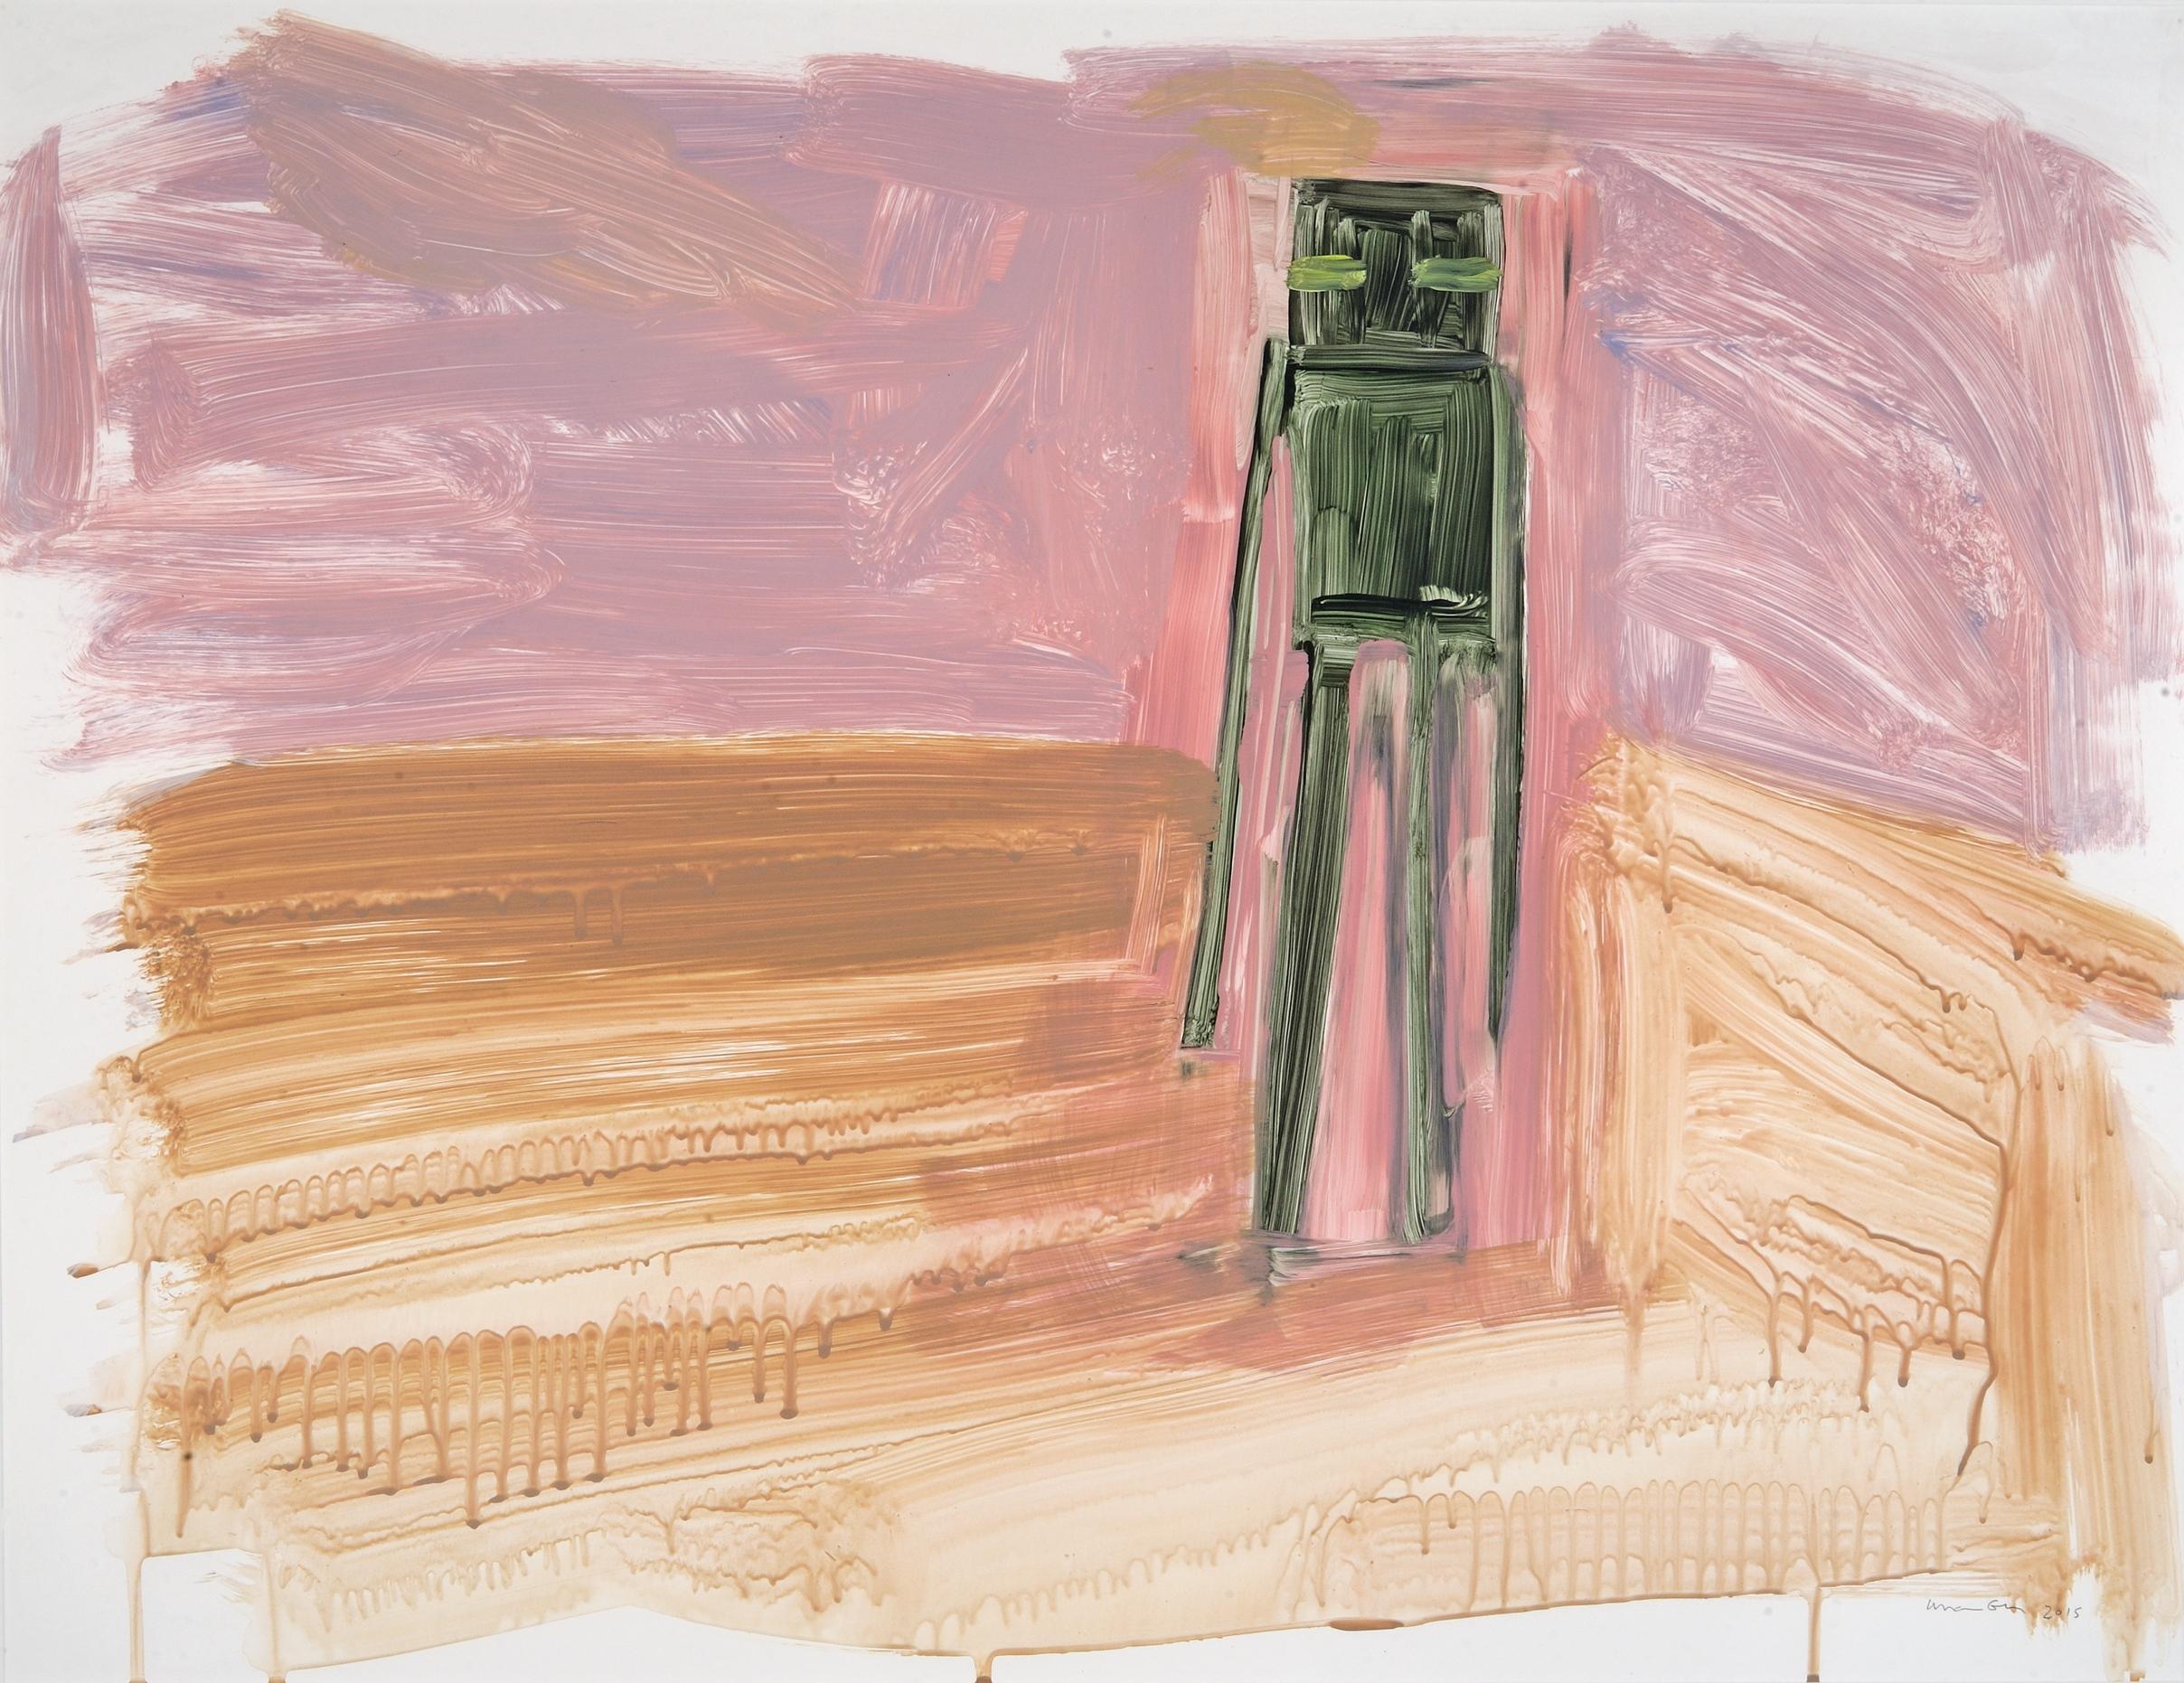 "Untitled (Enderman walking) Acrylic + gouache on Yupo, framed 26"" x 20"" (unframed) 2015"